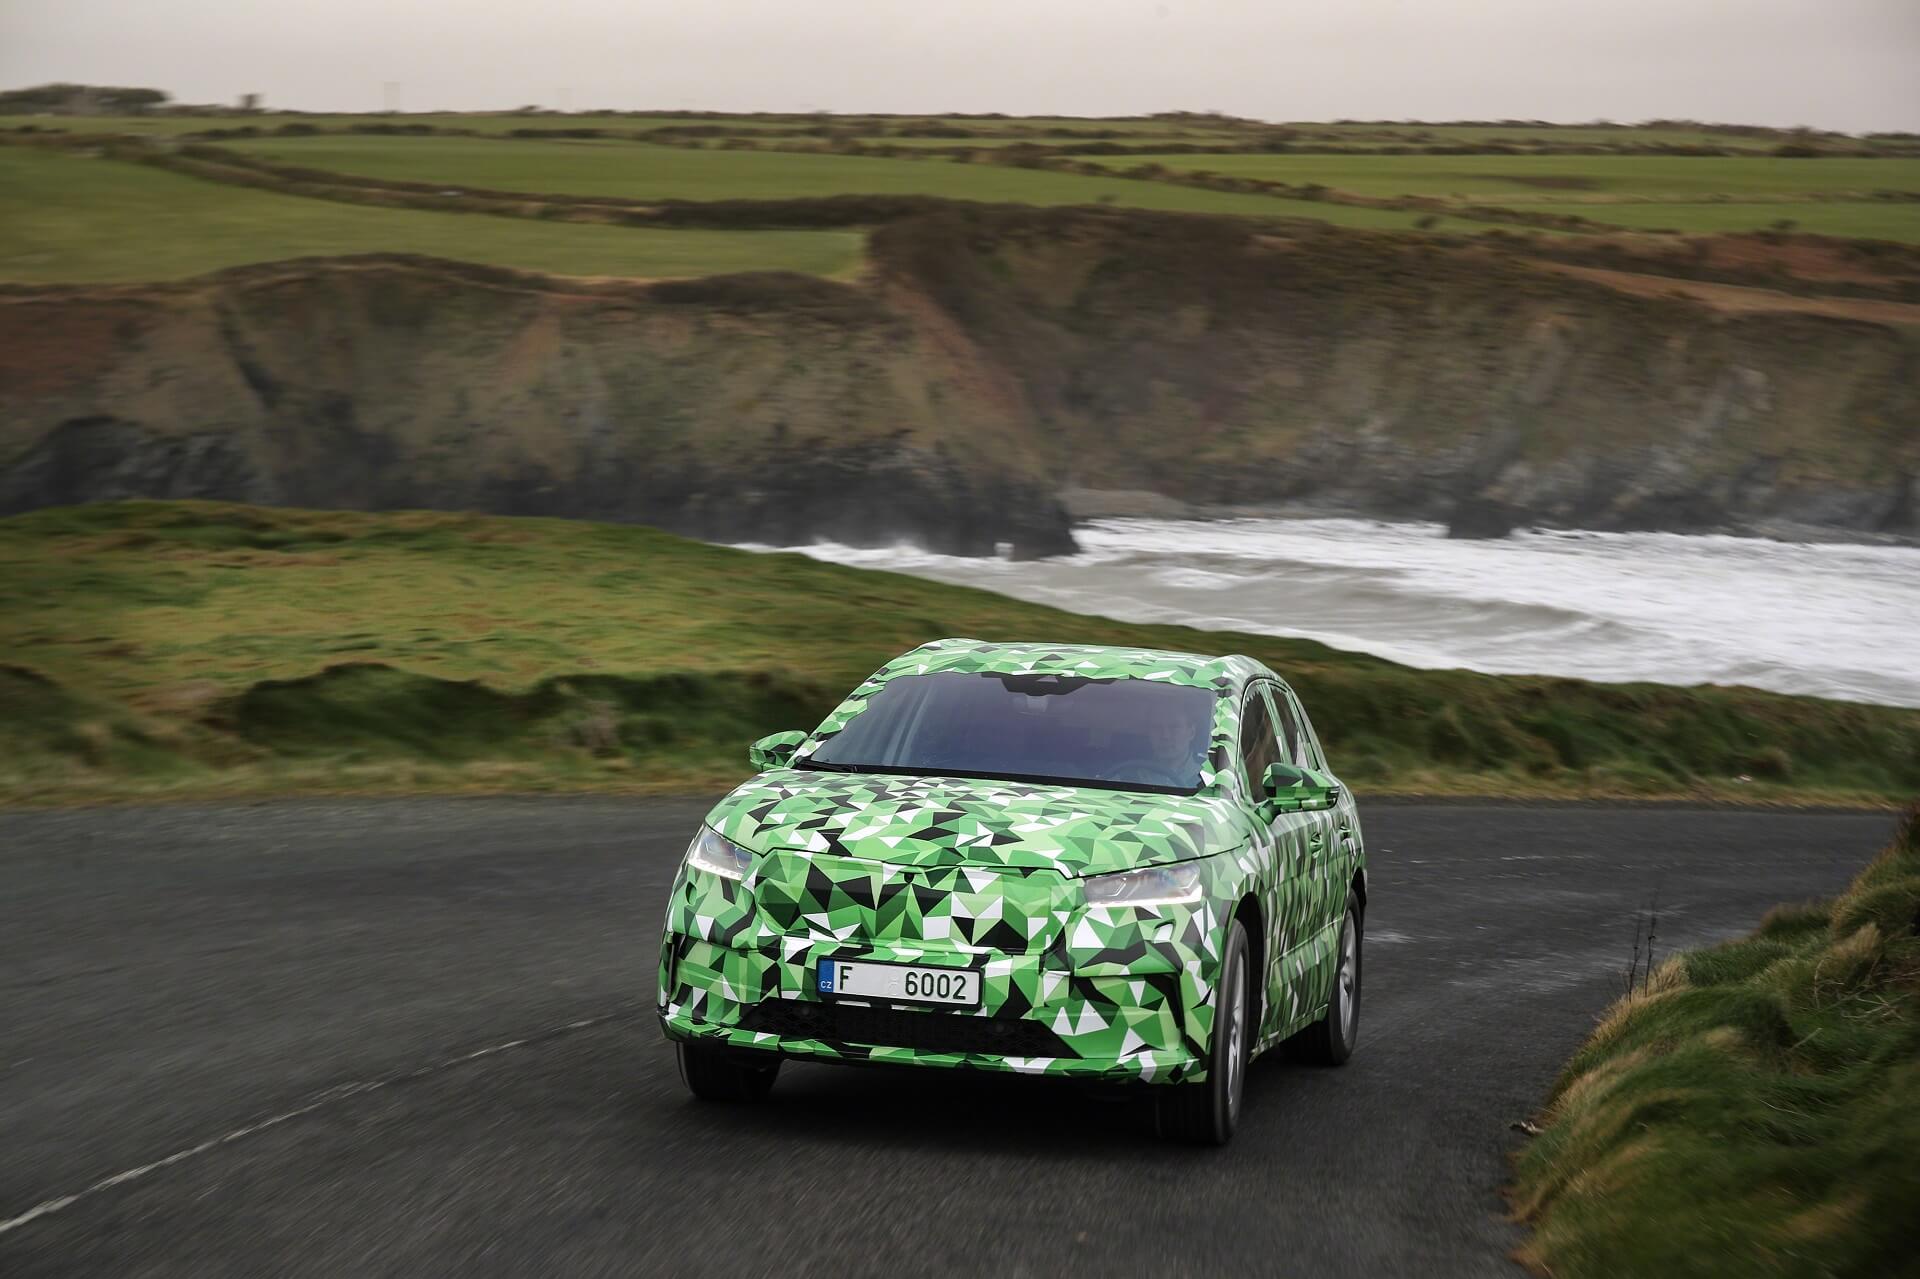 SKODA ENYAQ iV σε τοπίο στην Ιρλανδία - Λήψη σε κίνηση